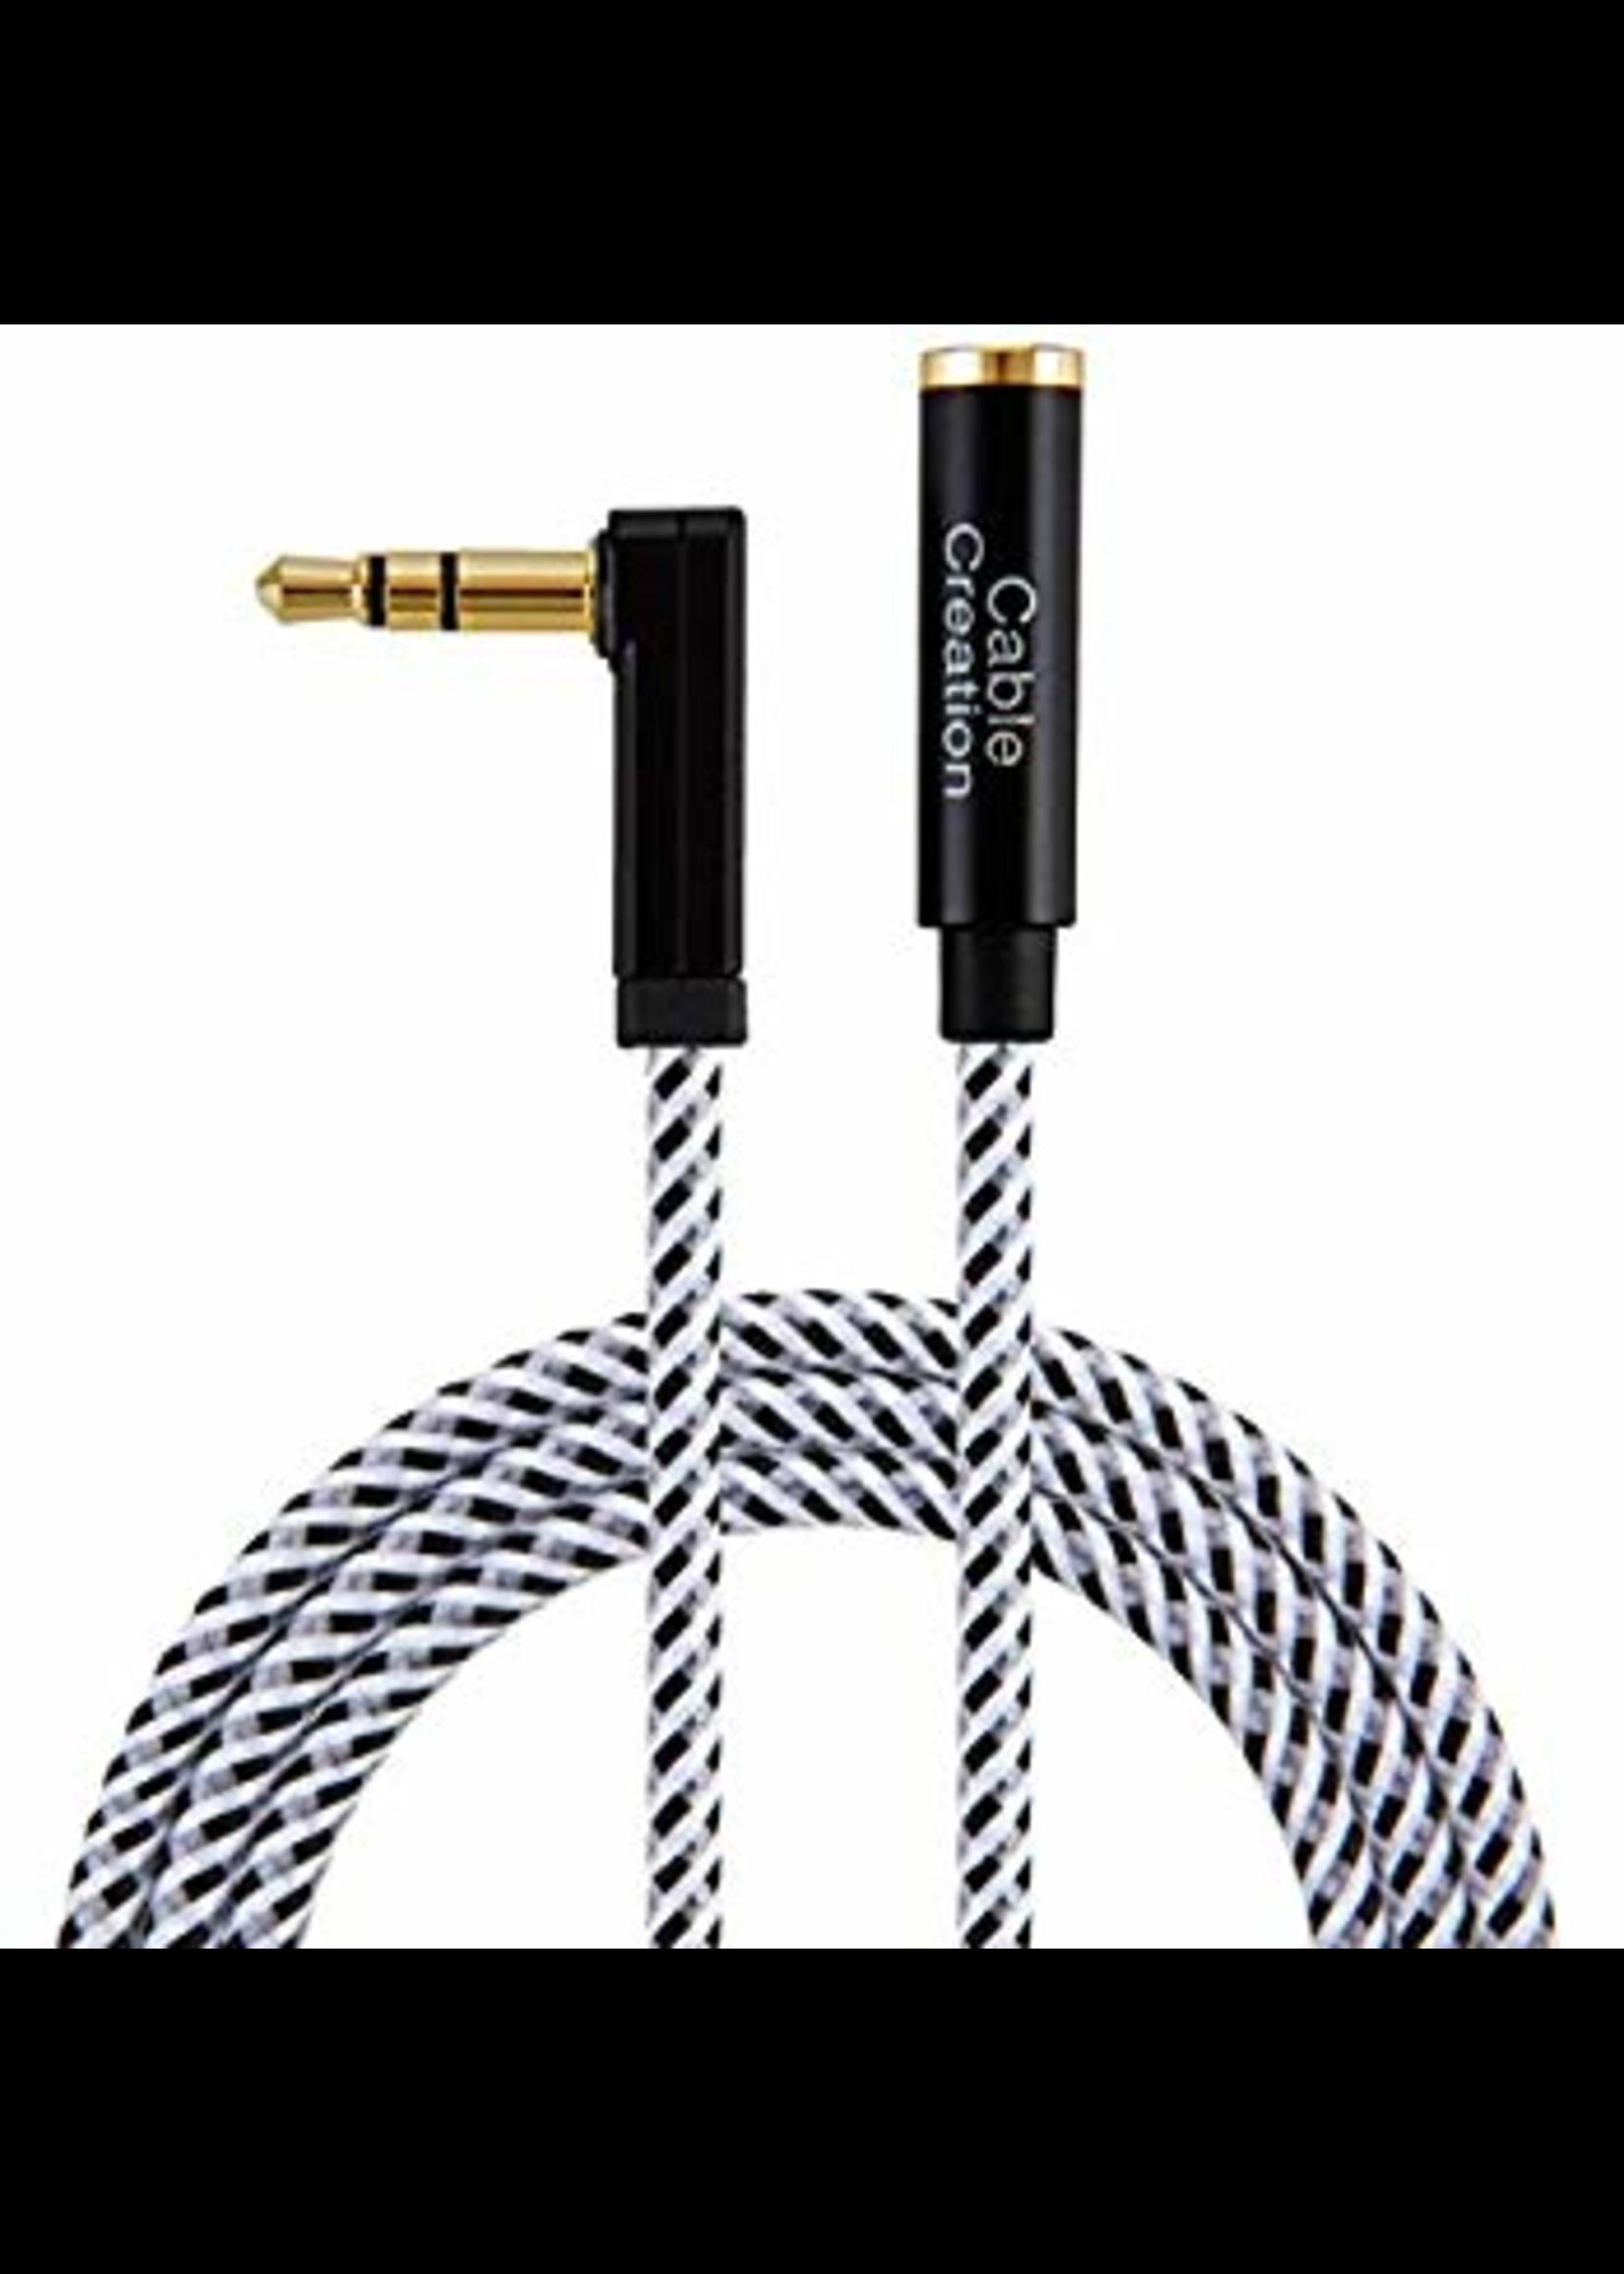 Cable-3.5mm AUX Extension Cable 6 FT, 90 Degree M-F AUX Cable